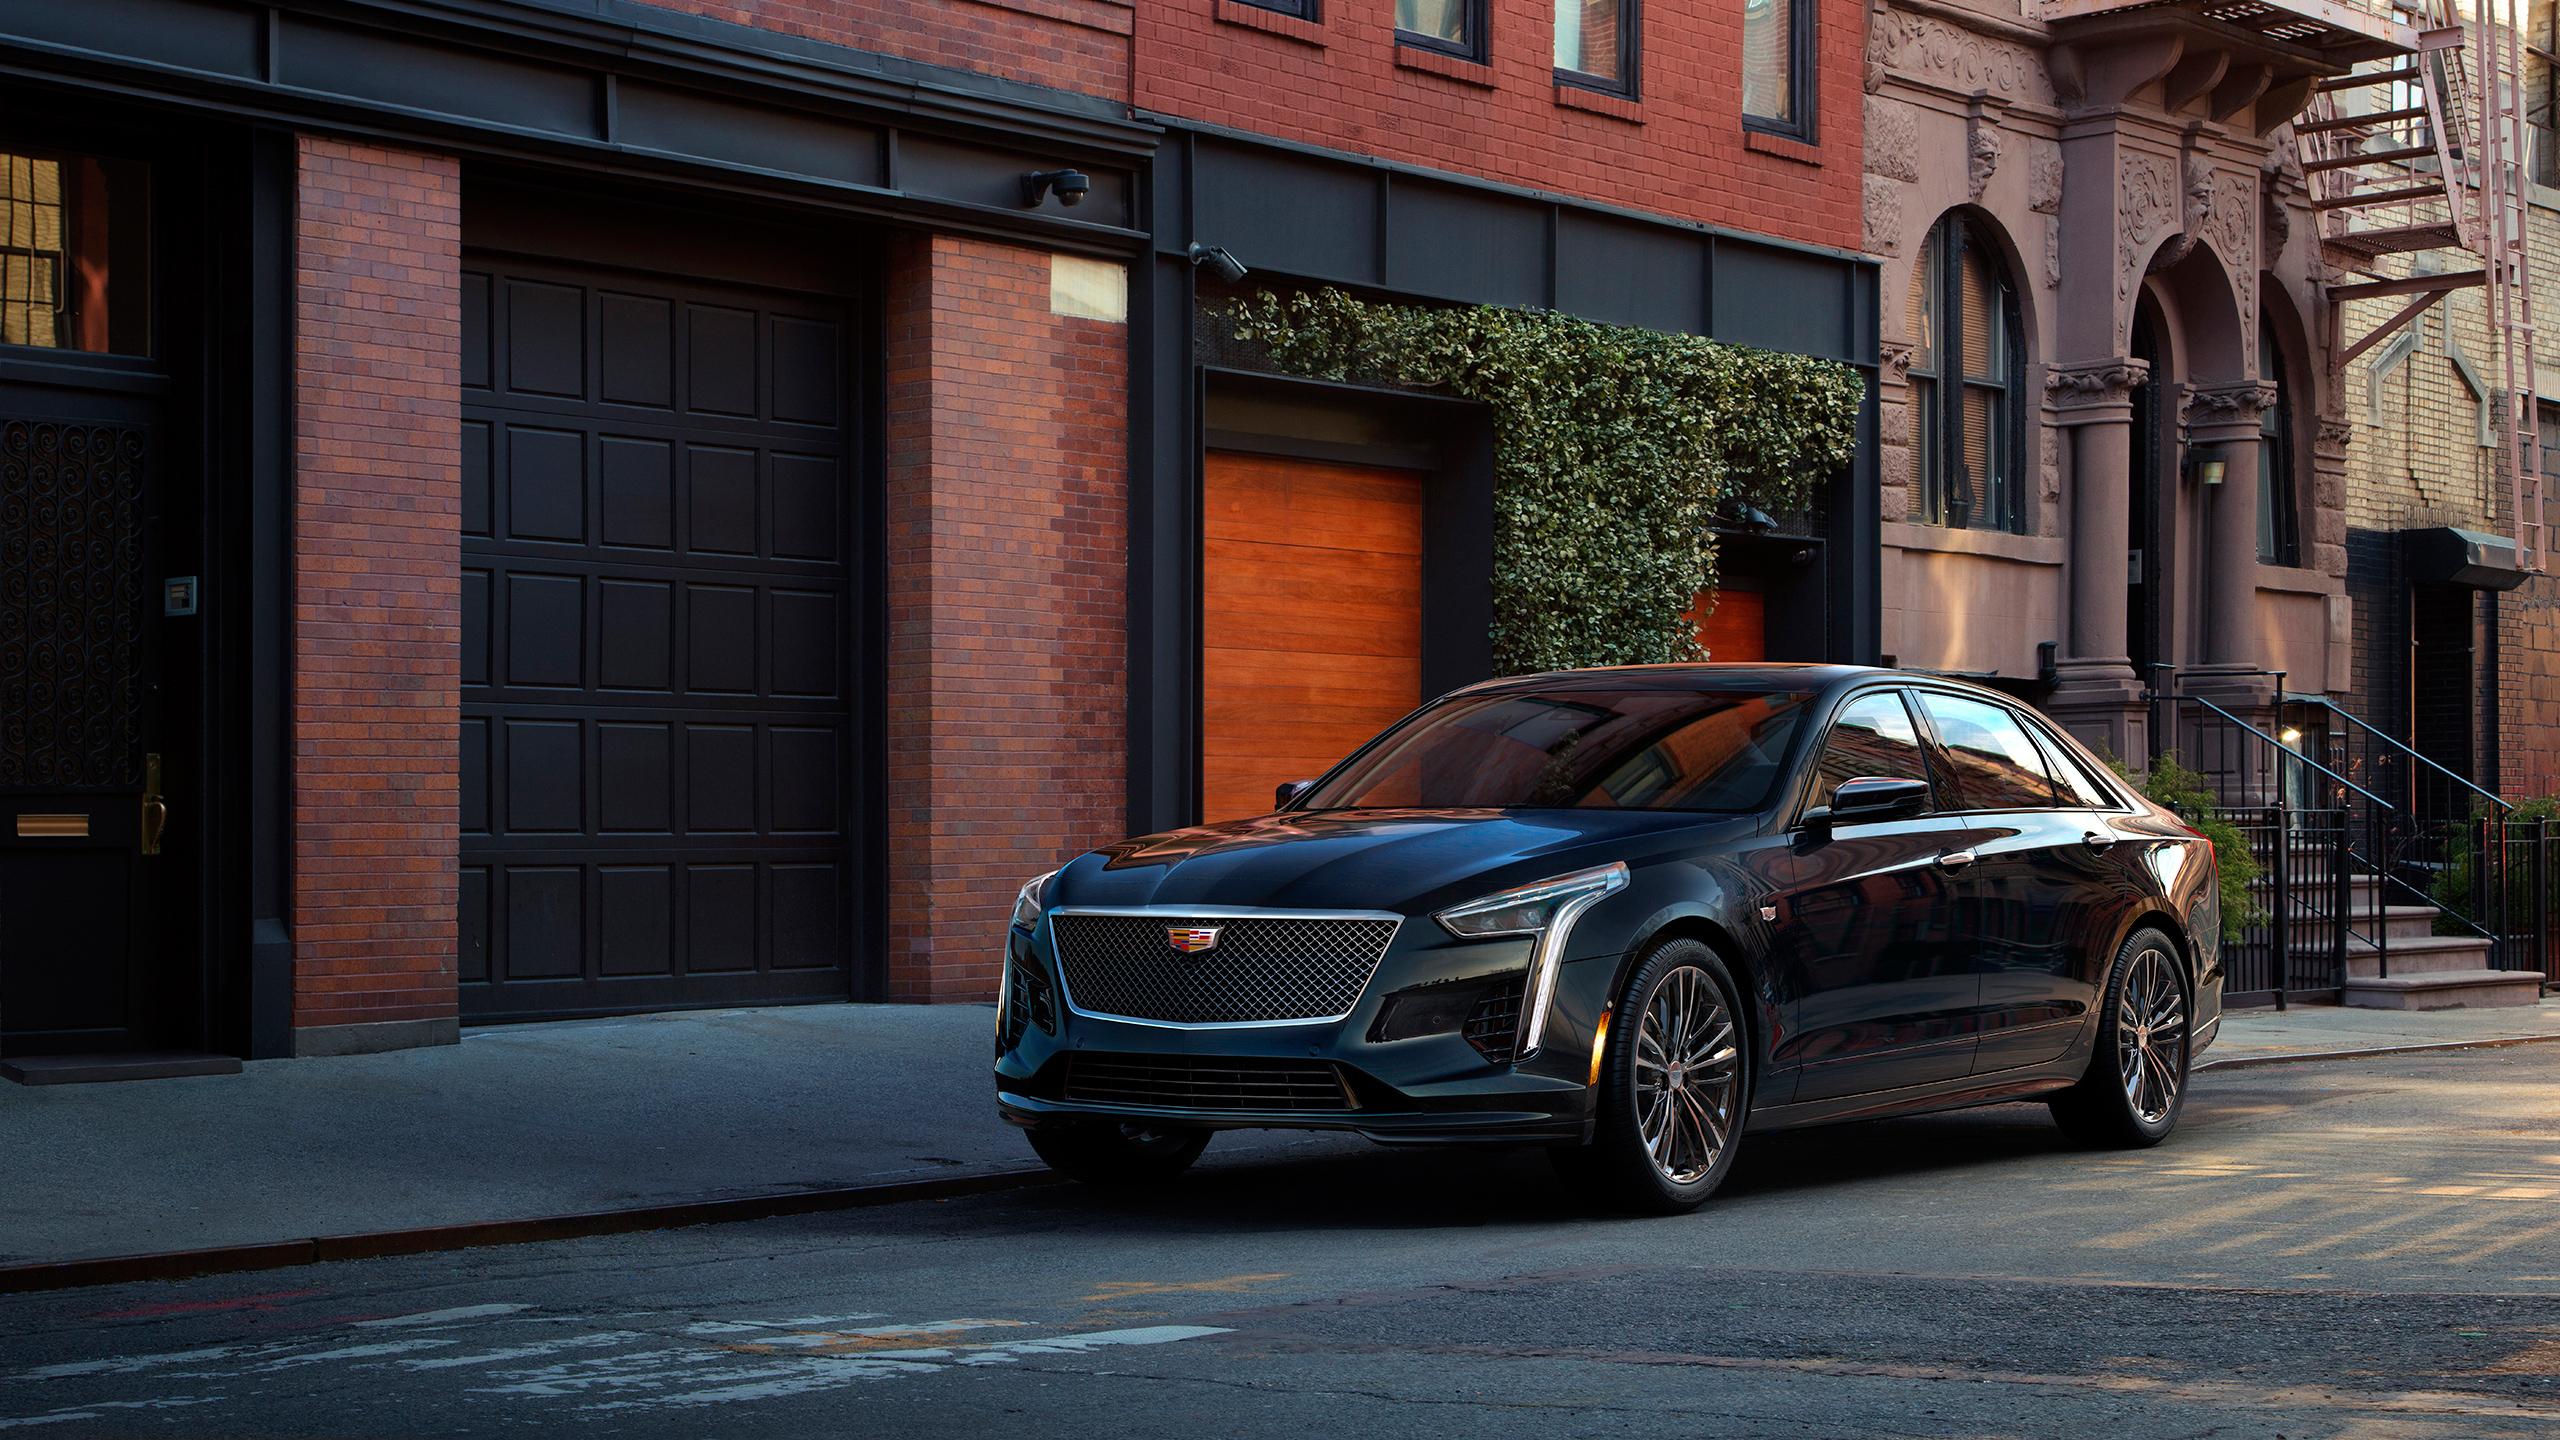 2018 Cadillac Ats >> 2019 Cadillac CT6 V Sport 2 Wallpaper | HD Car Wallpapers | ID #10010